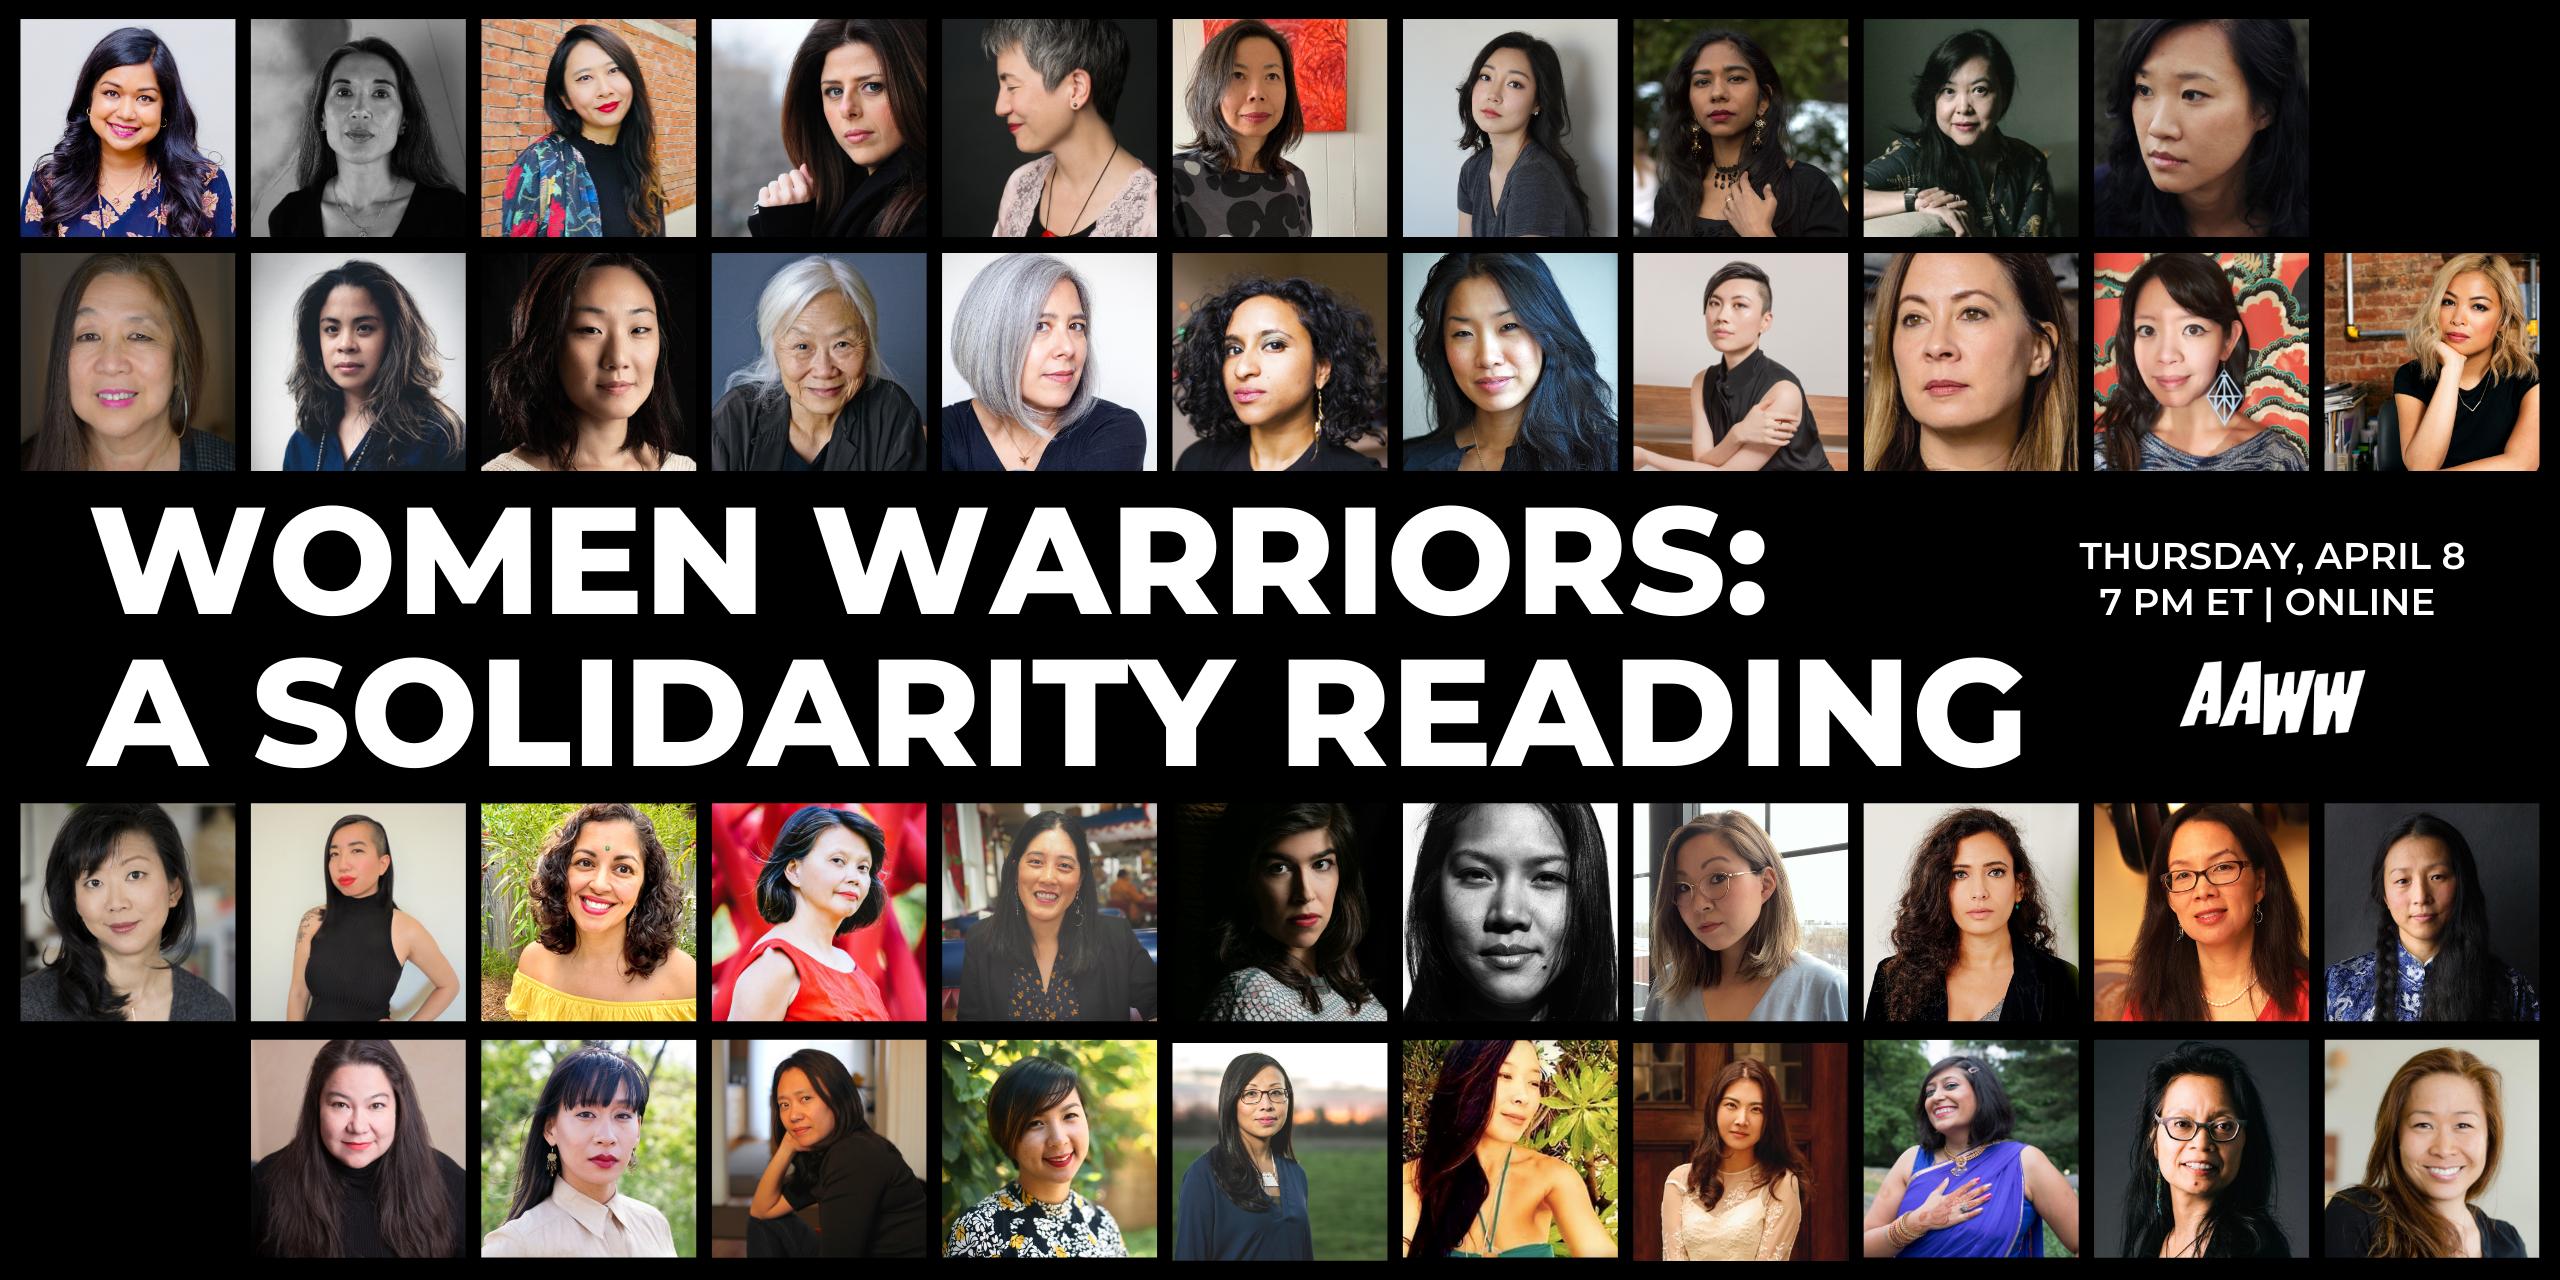 Women Warriors: A Solidarity Reading